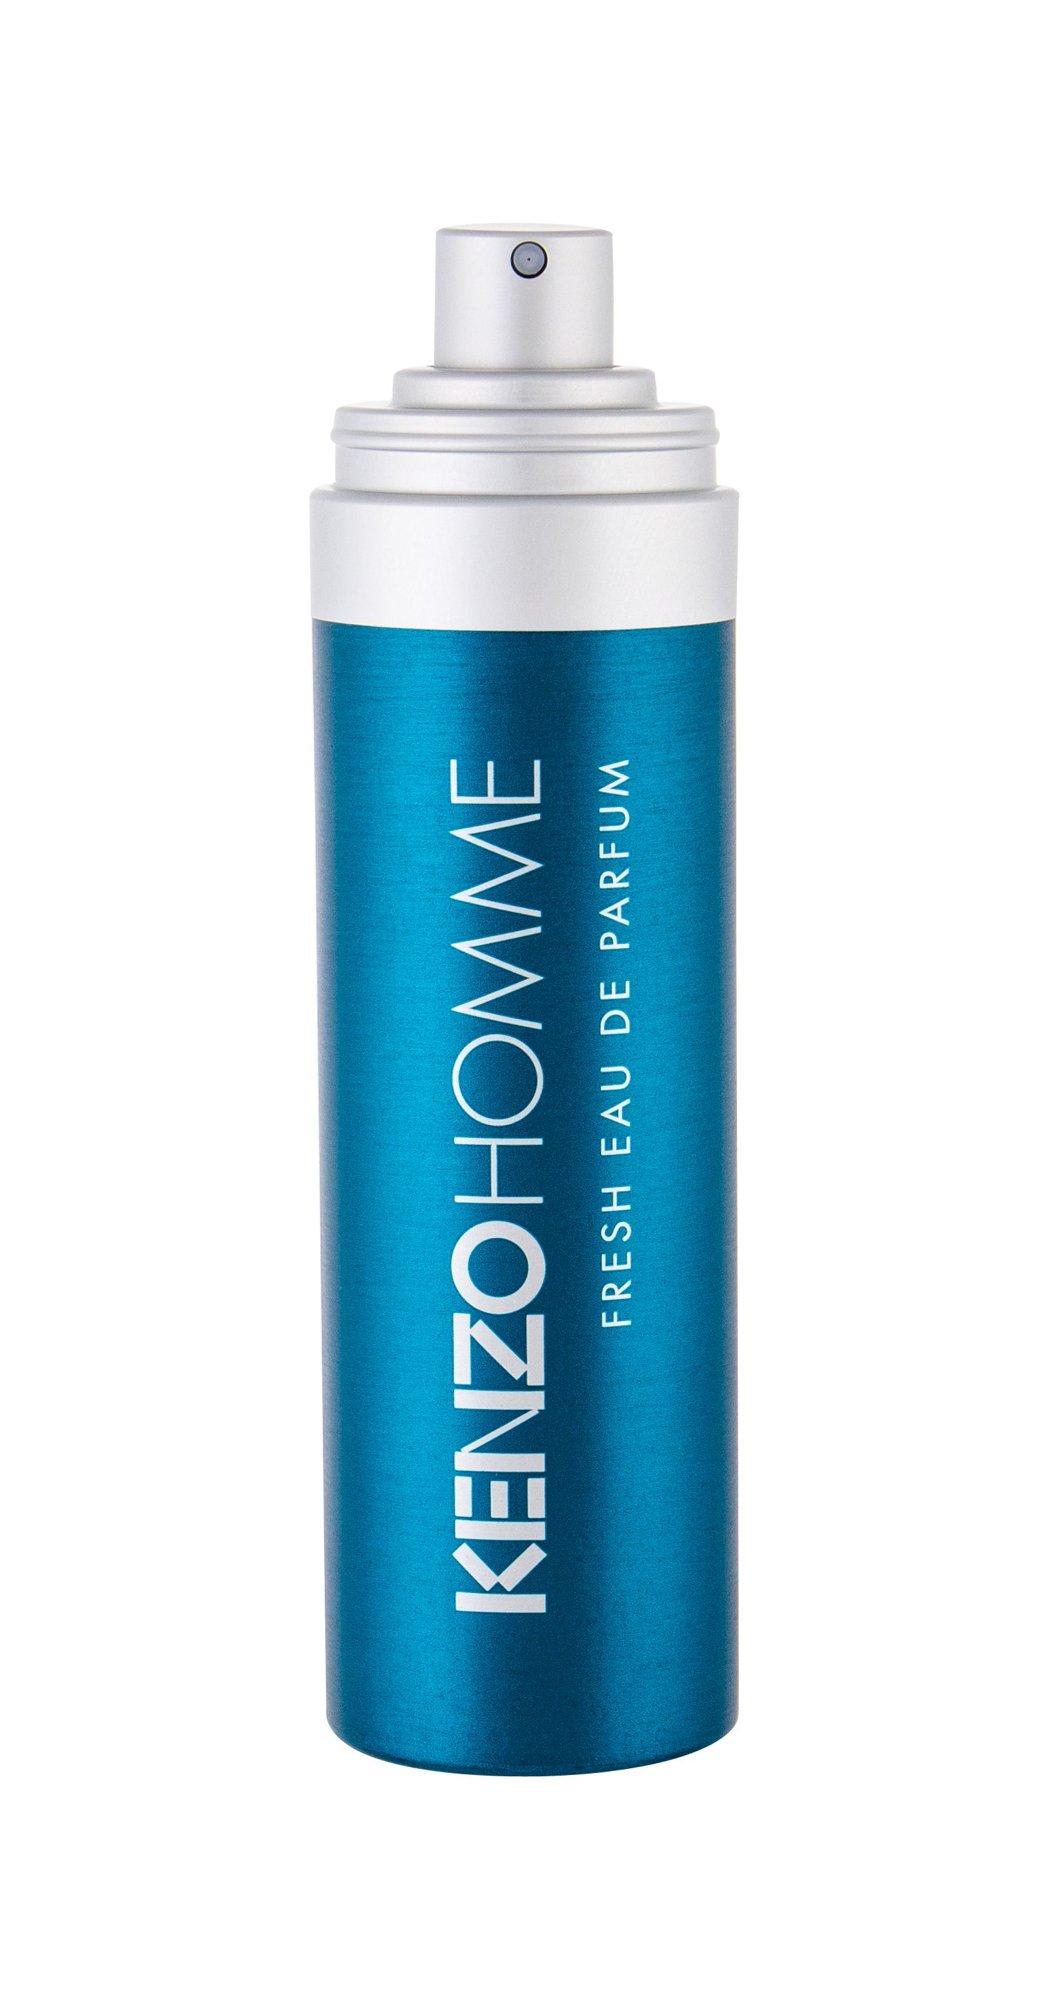 KENZO Pour Homme Fresh, Parfumovaná voda 100ml, Tester